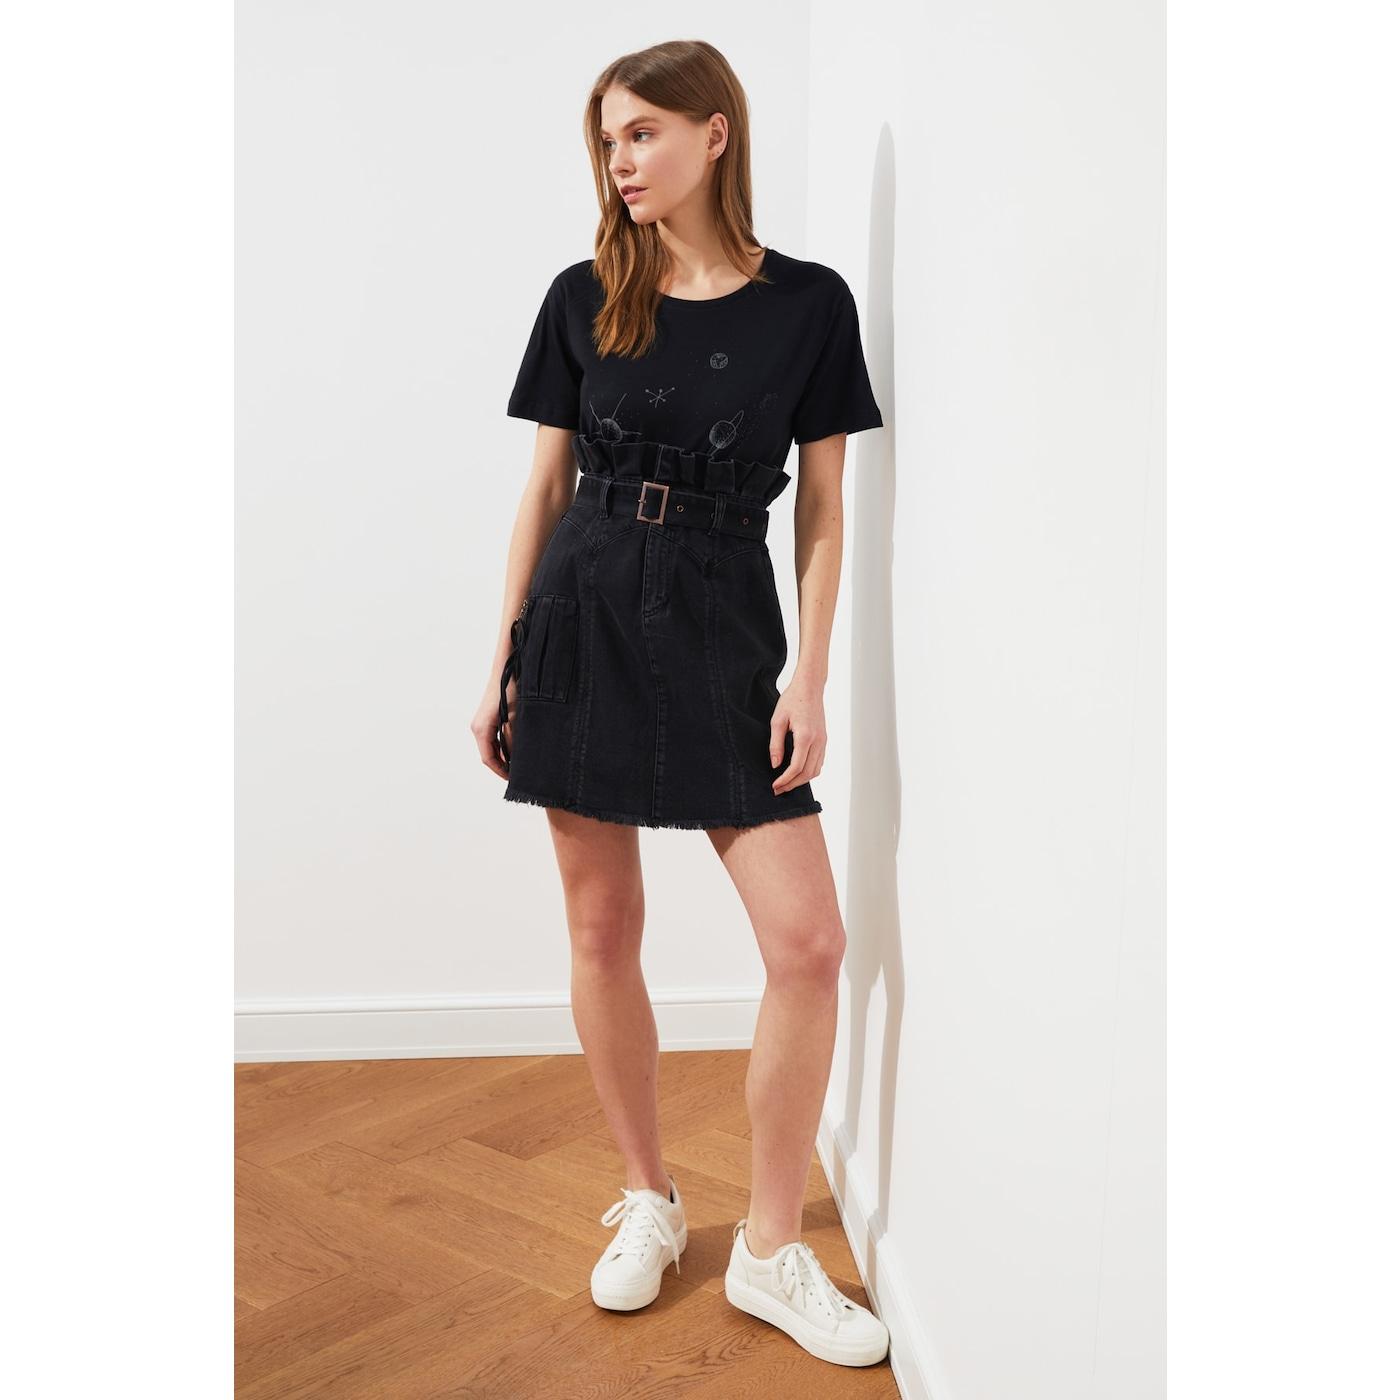 Trendyol Anthracite Waist Ruffled Belt Mini Denim Skirt dámské 34